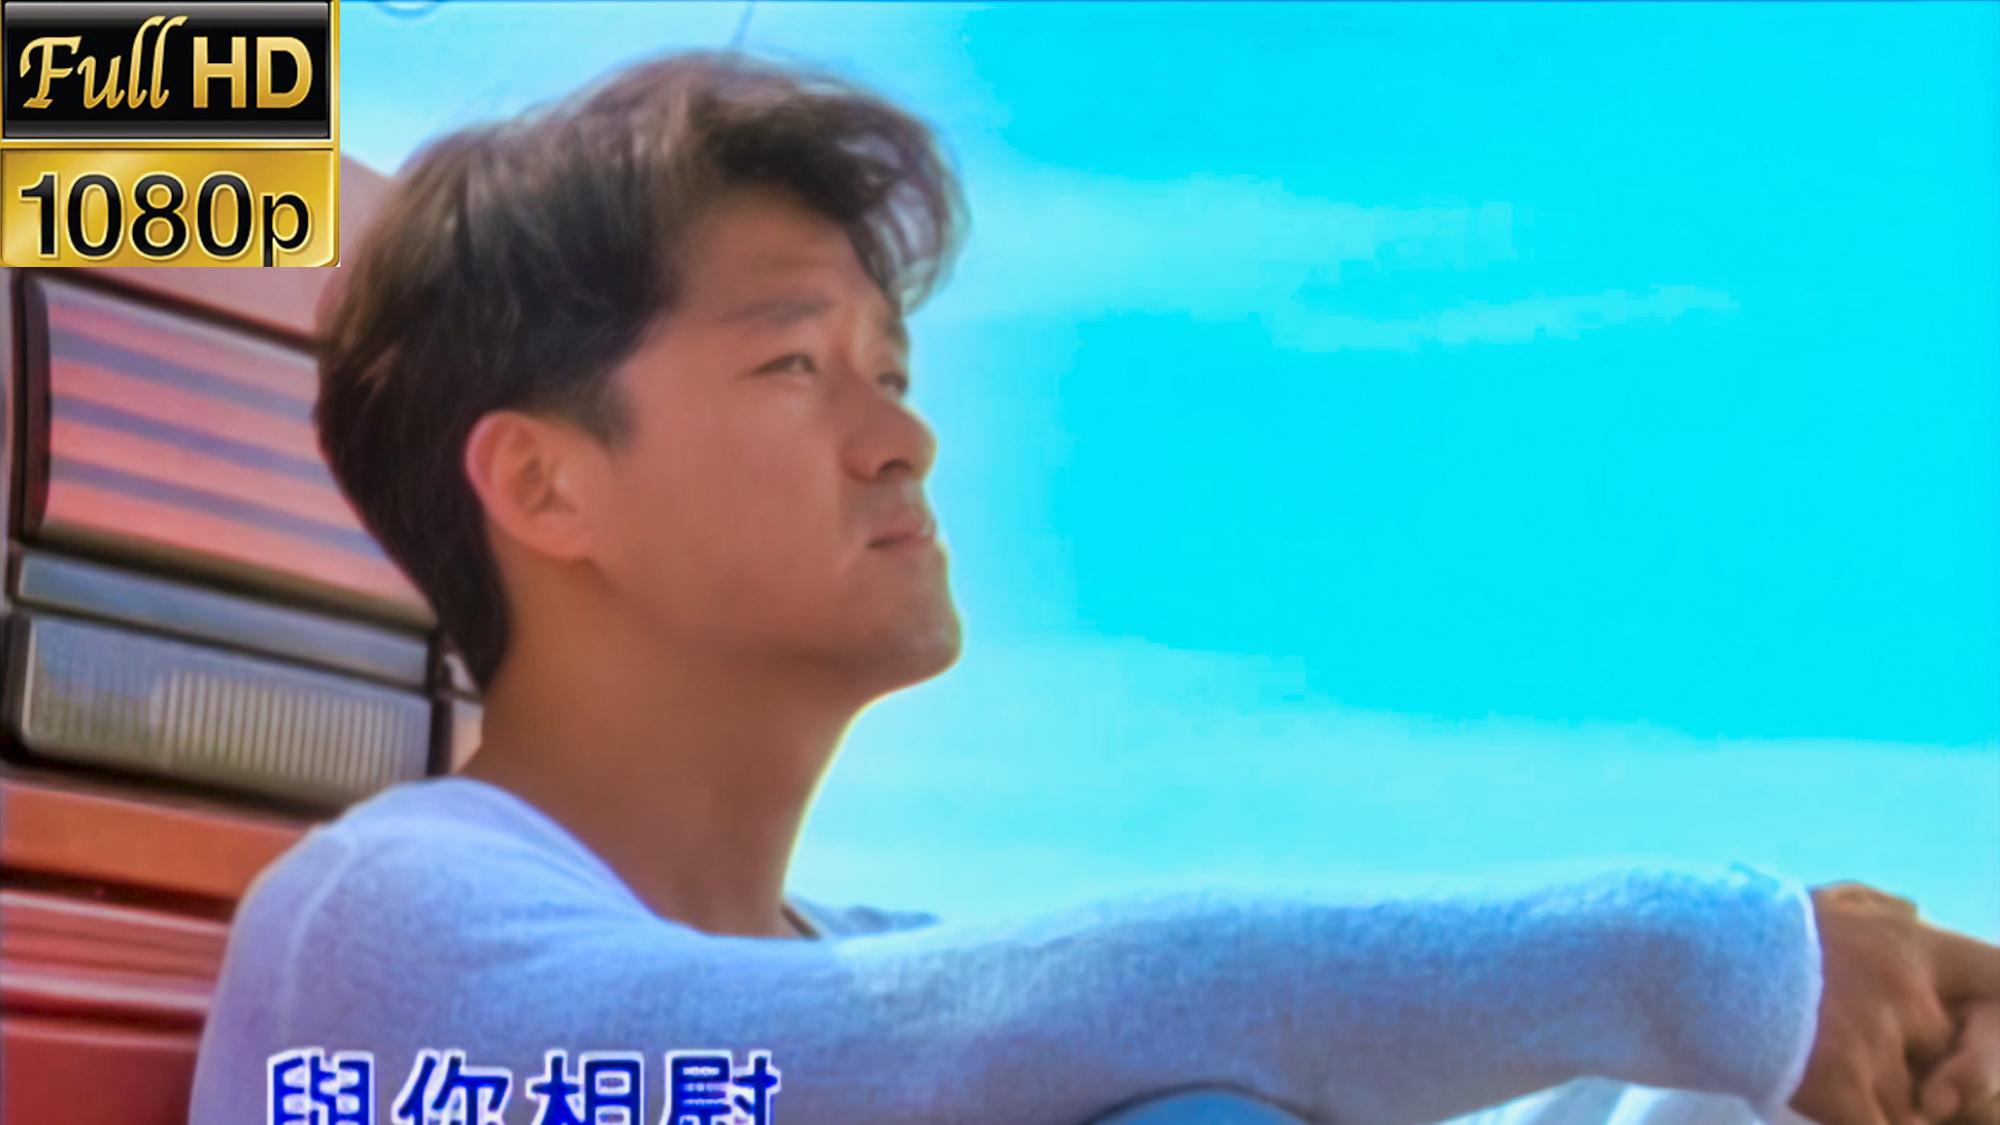 【1080p修复】【华语经典】那些年我们听过的华语金曲【第一期】